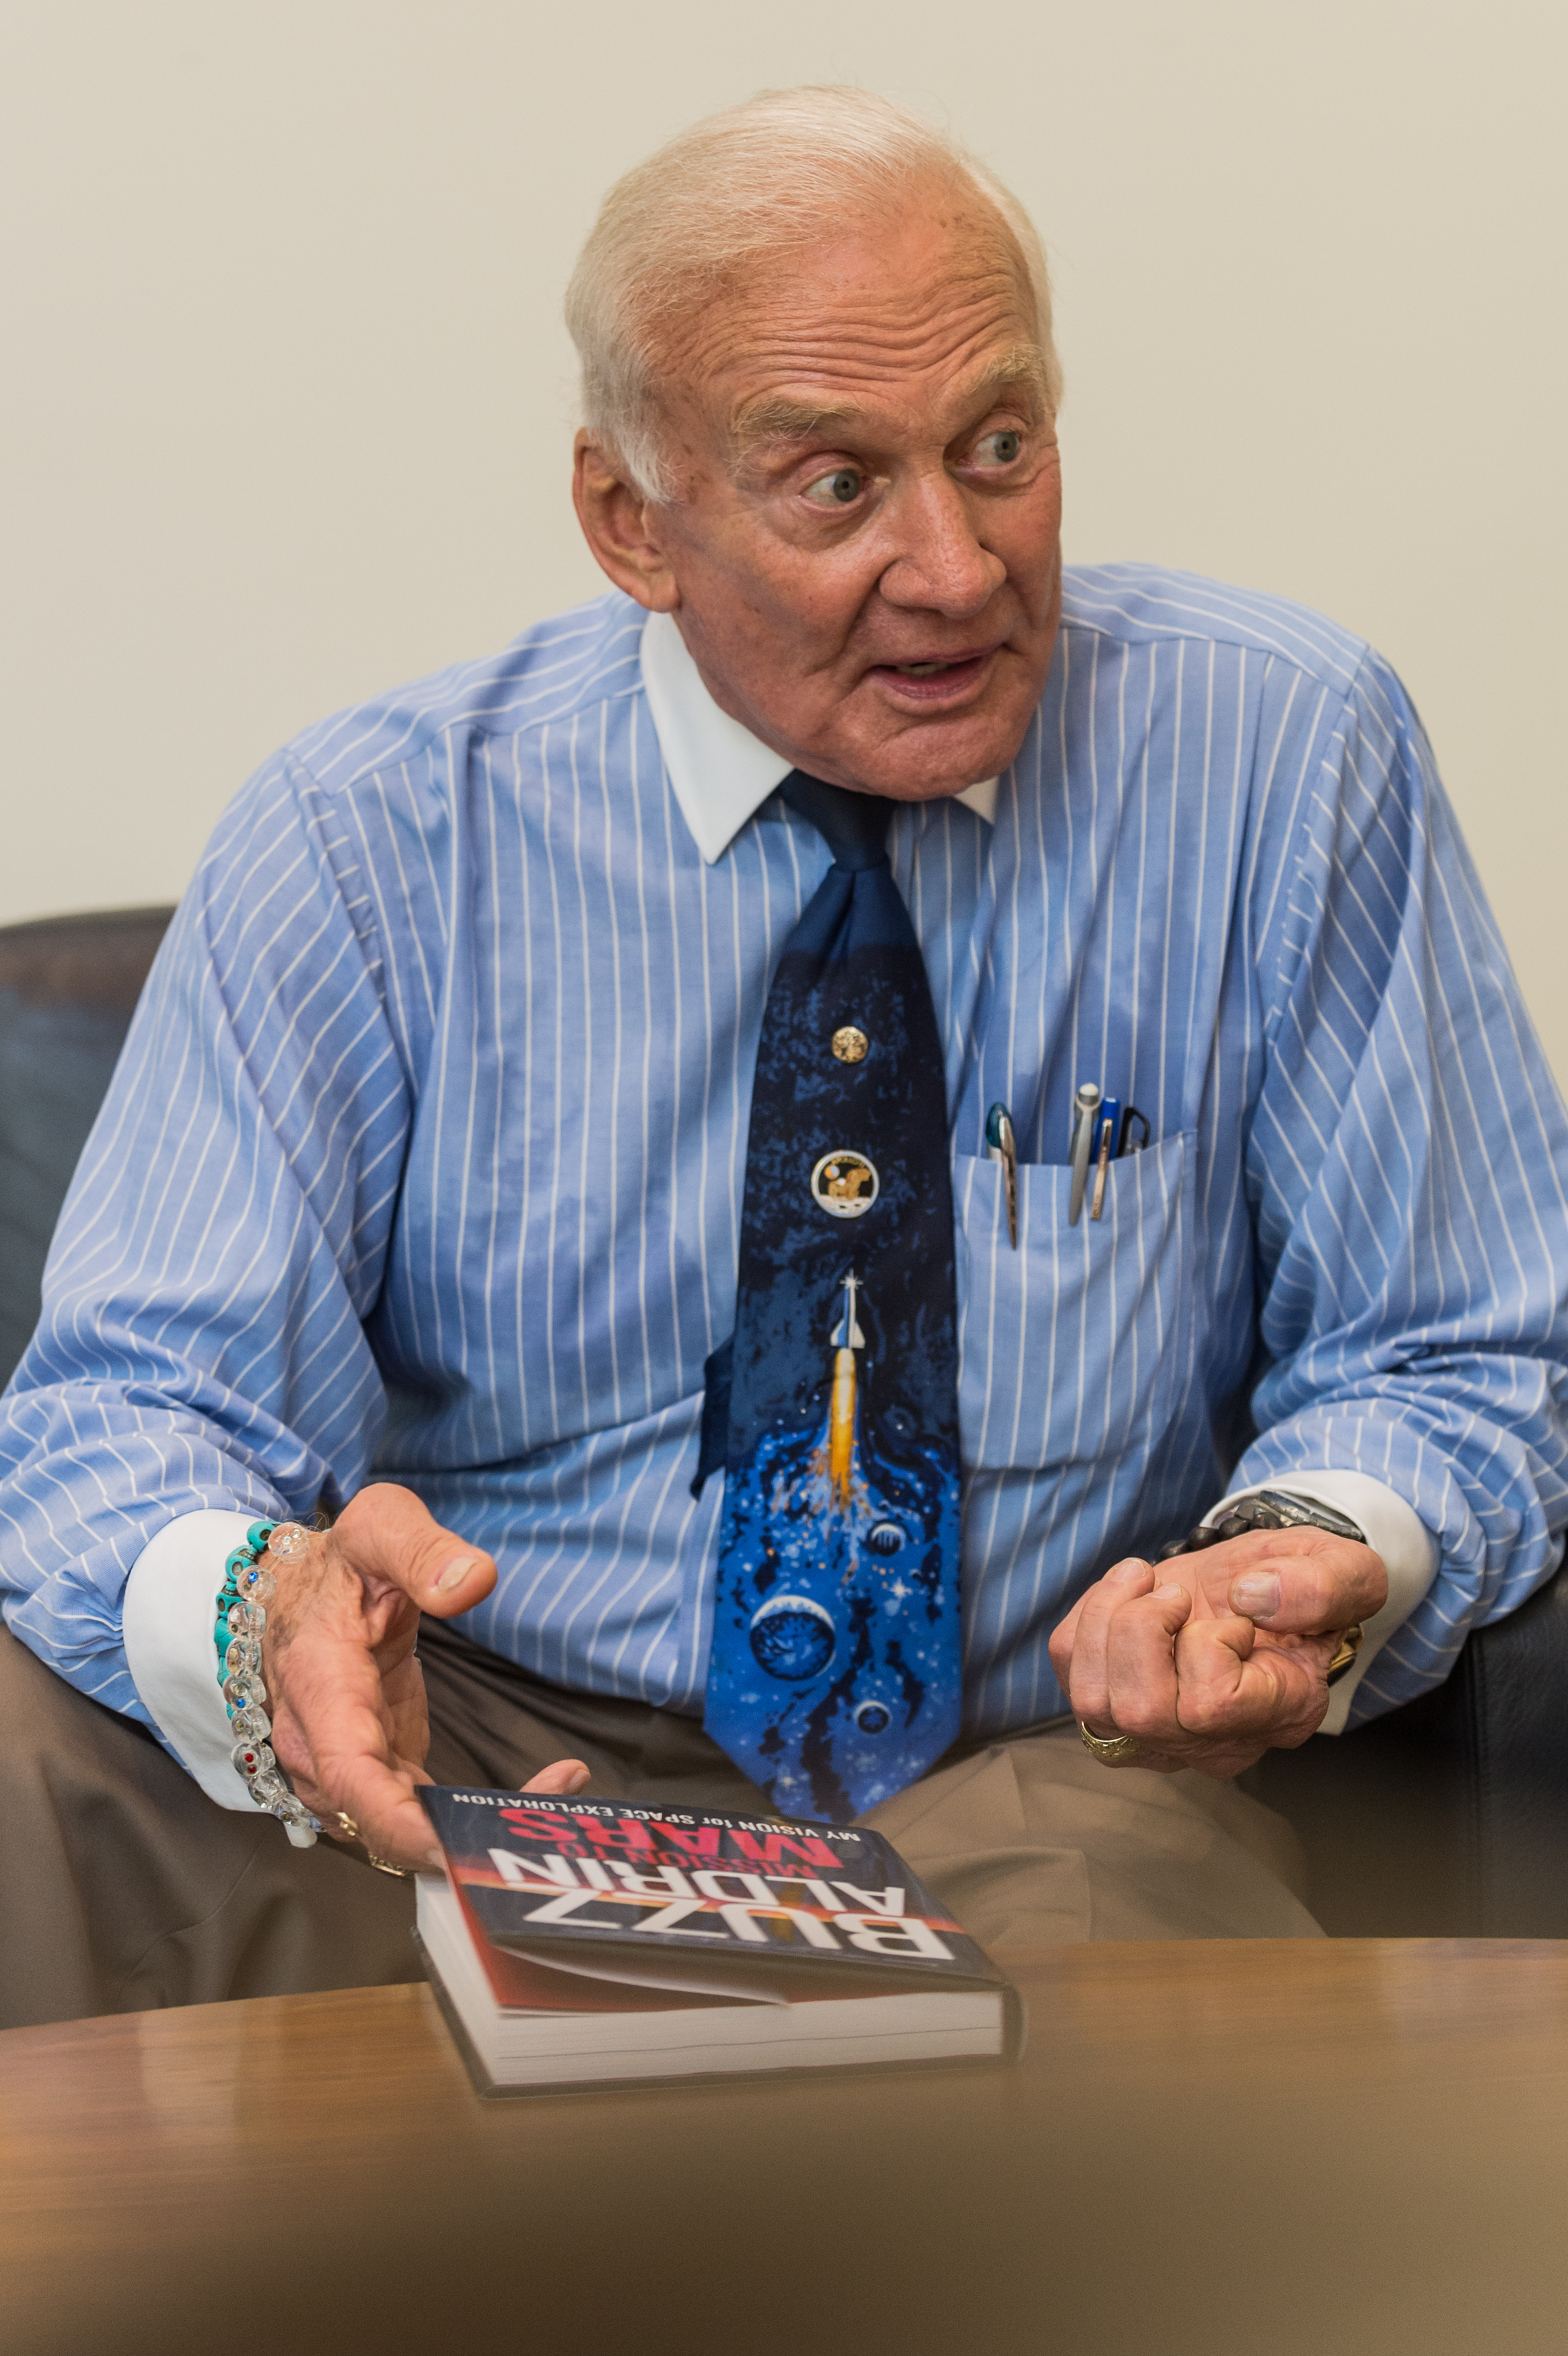 Buzz-Aldrin-HiRes-2843.jpg